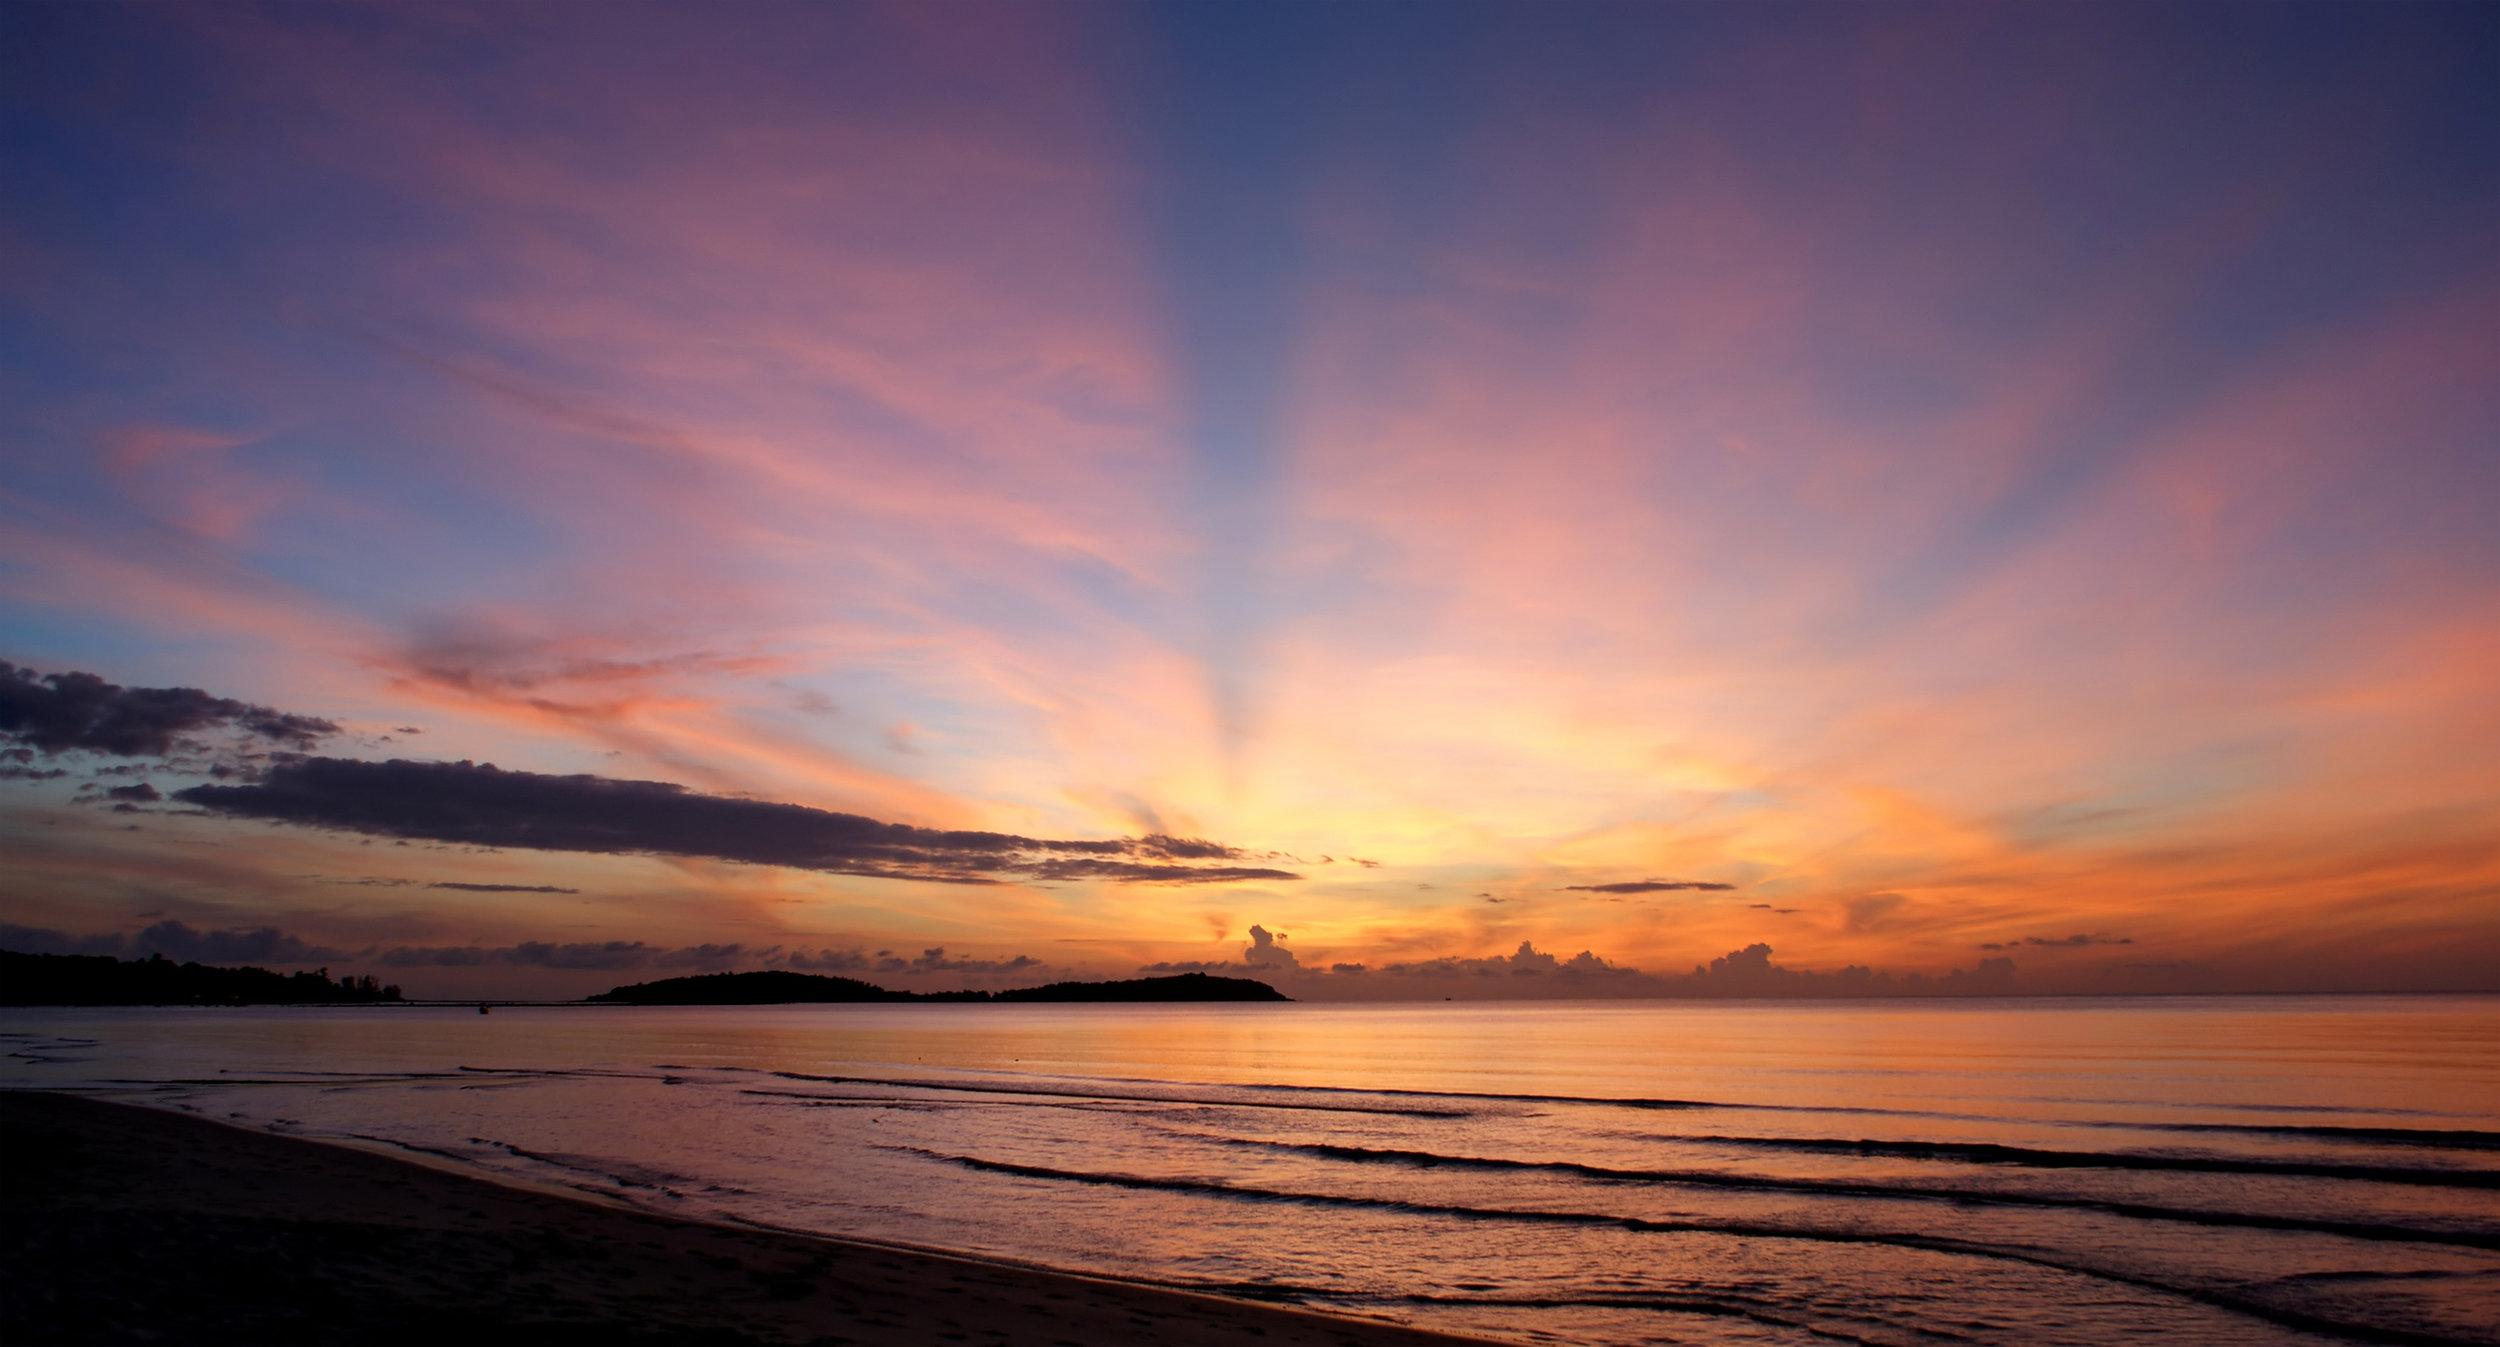 sunrisepic.jpg